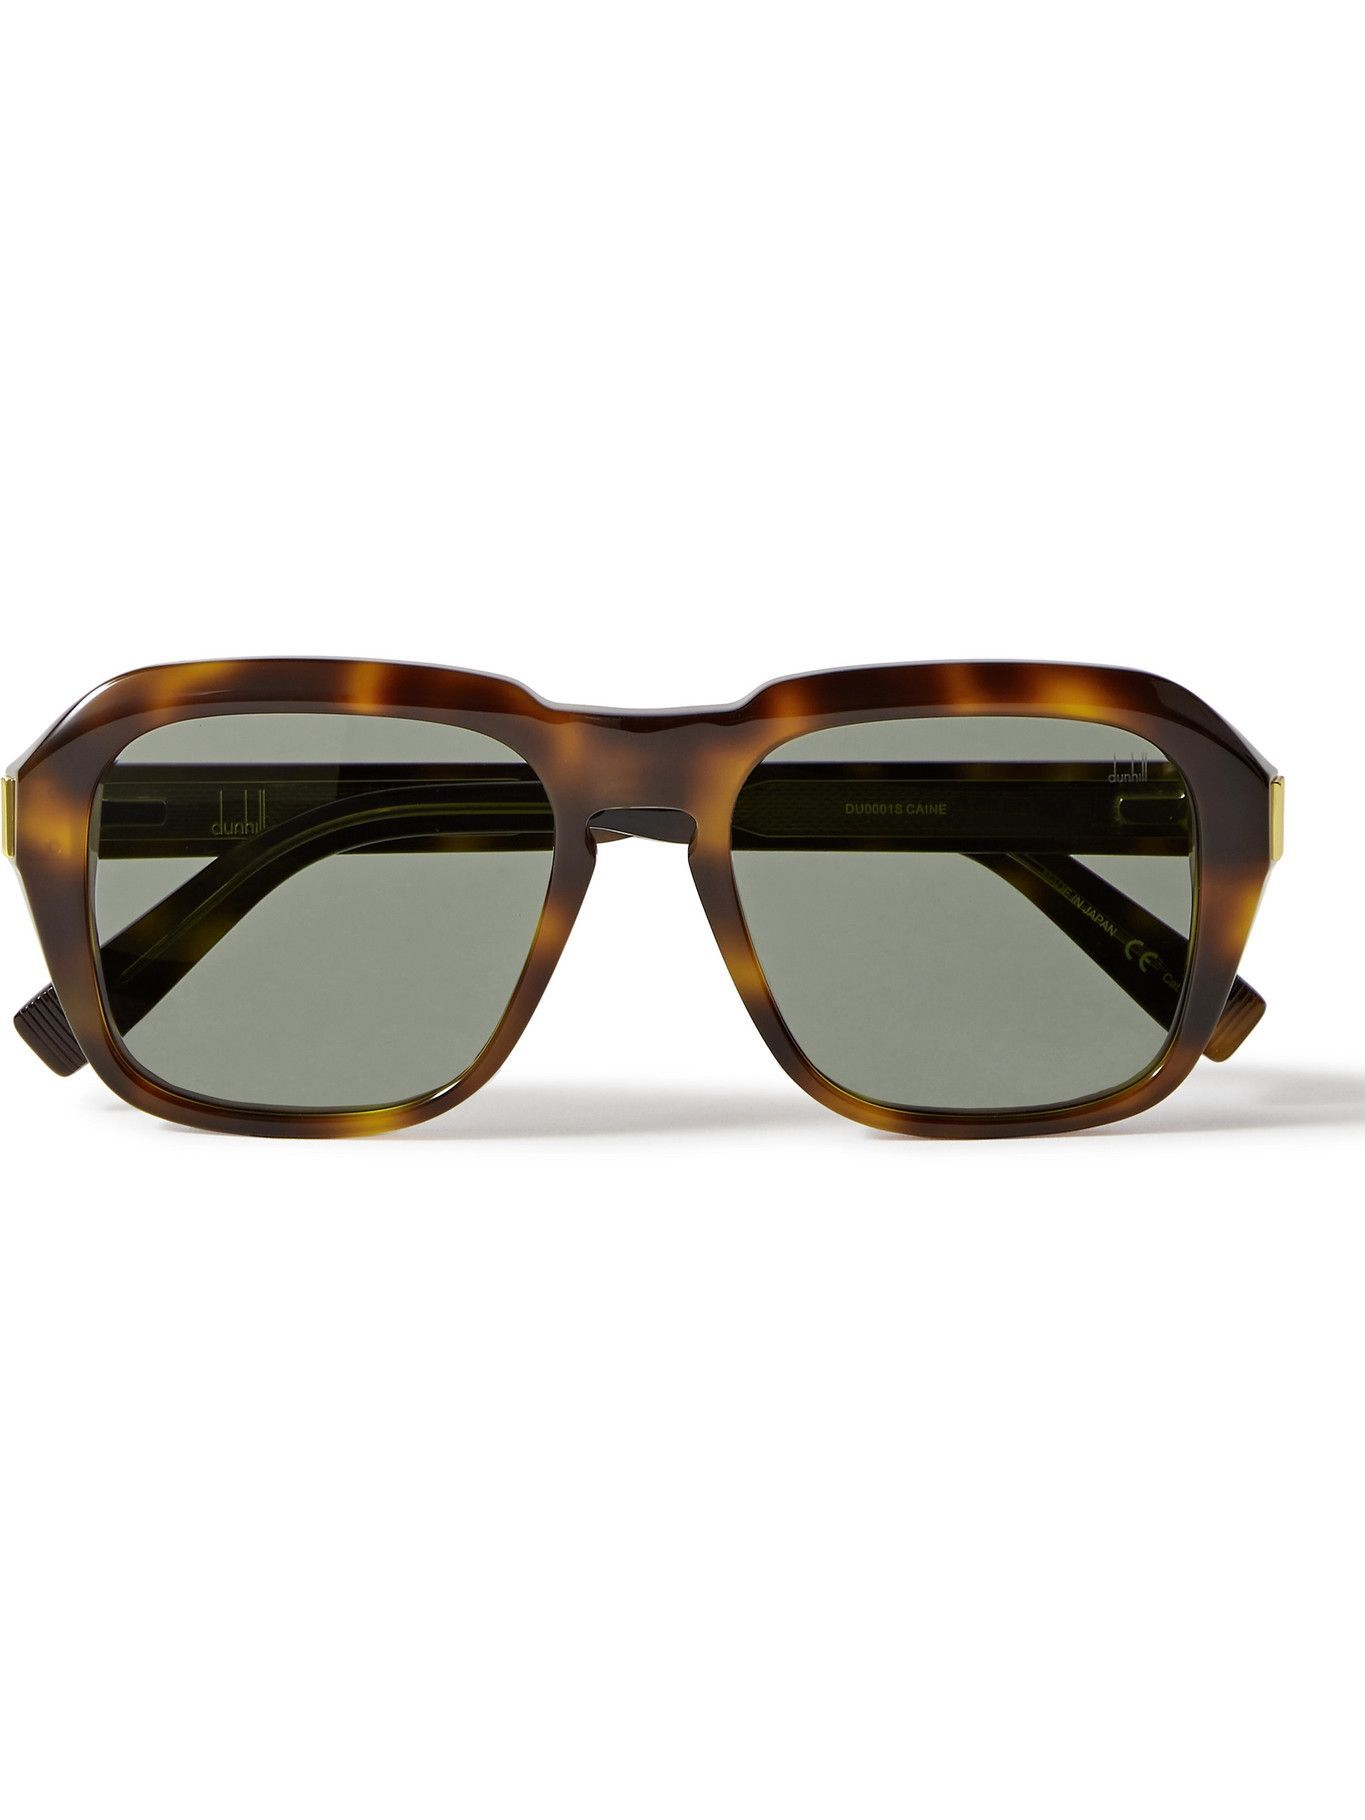 DUNHILL - Round-Frame Tortoiseshell Acetate Sunglasses